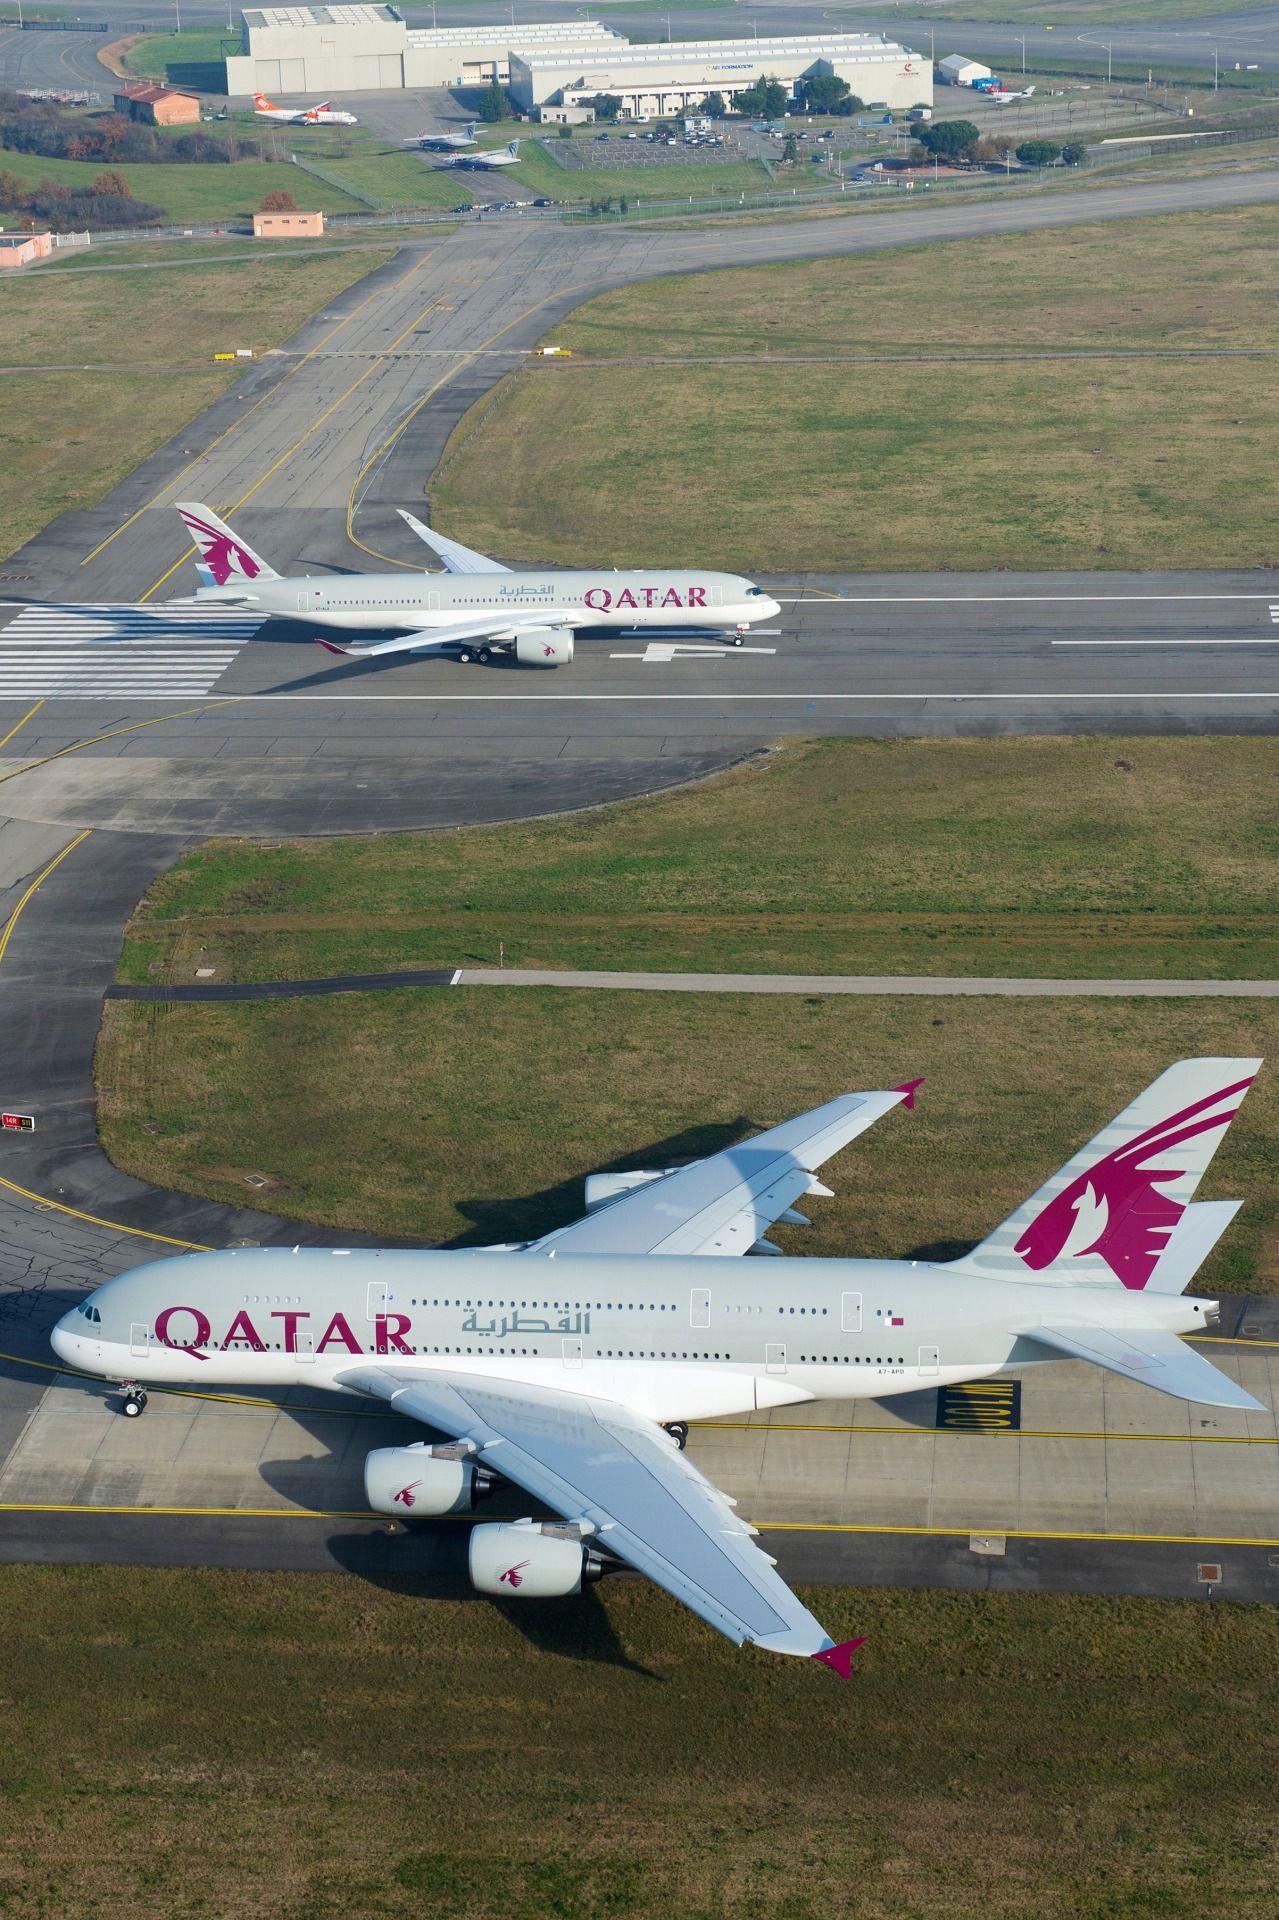 Qatar Airways qatar and scandinavia trip 281115 bkk doh